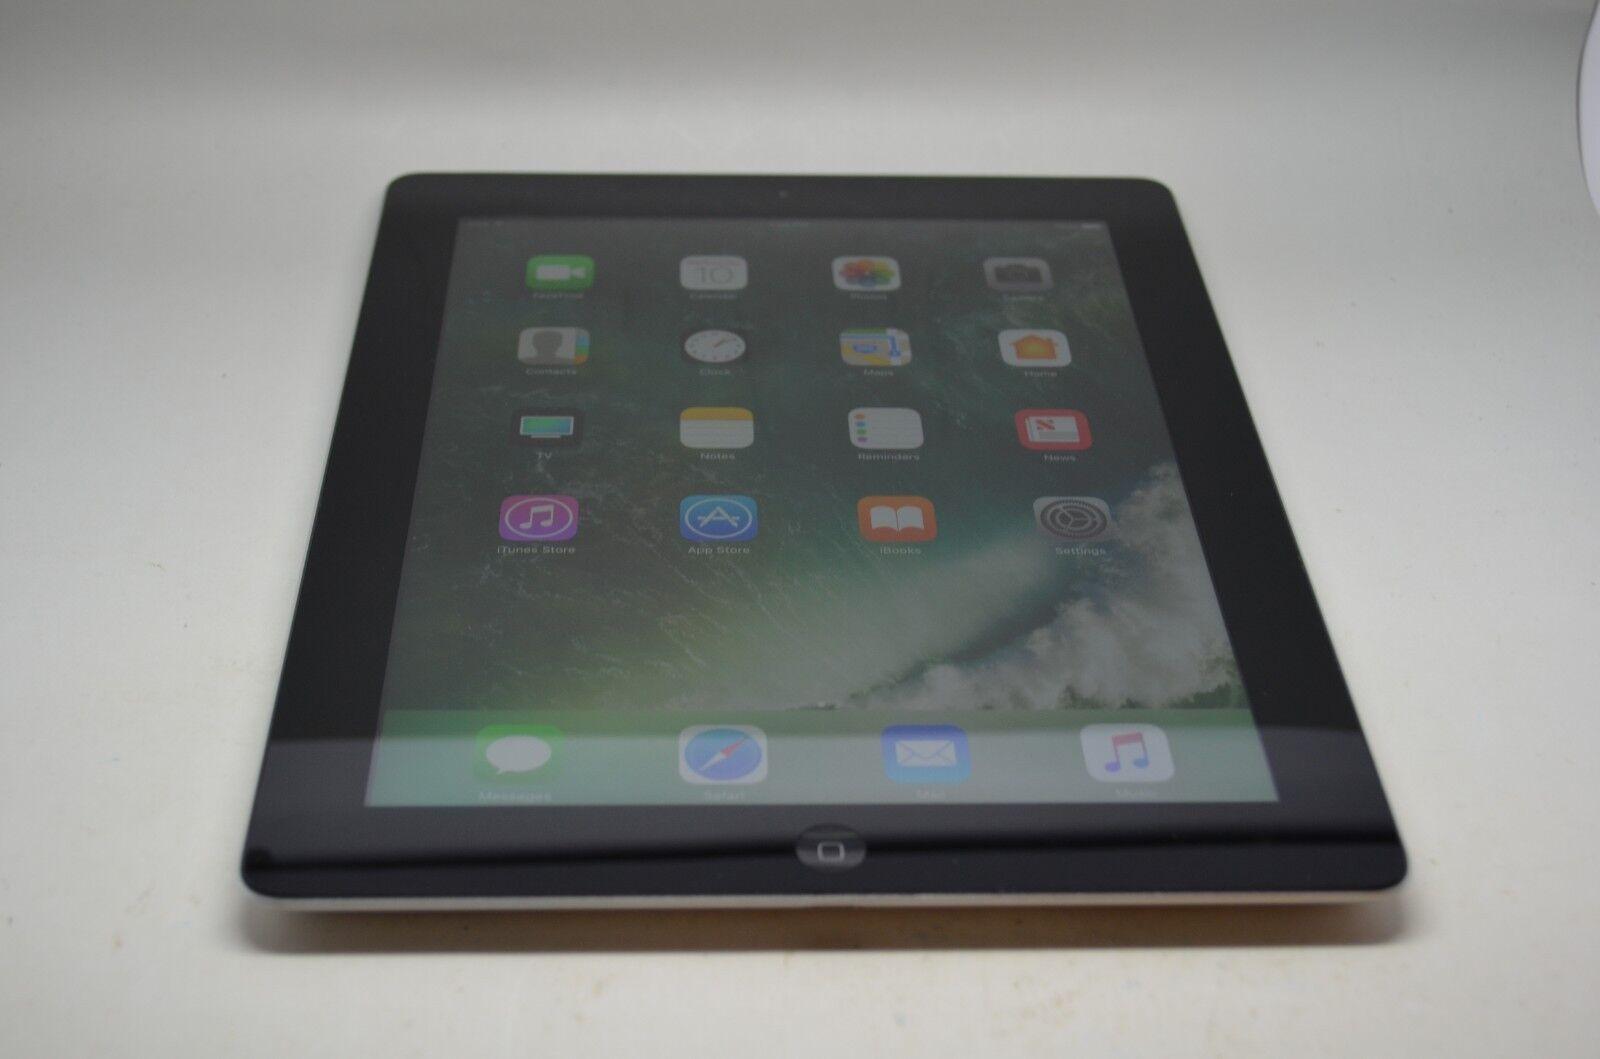 Apple iPad 4th Gen. 16GB, Wi-Fi, 9.7in, - Black, Good Condition!